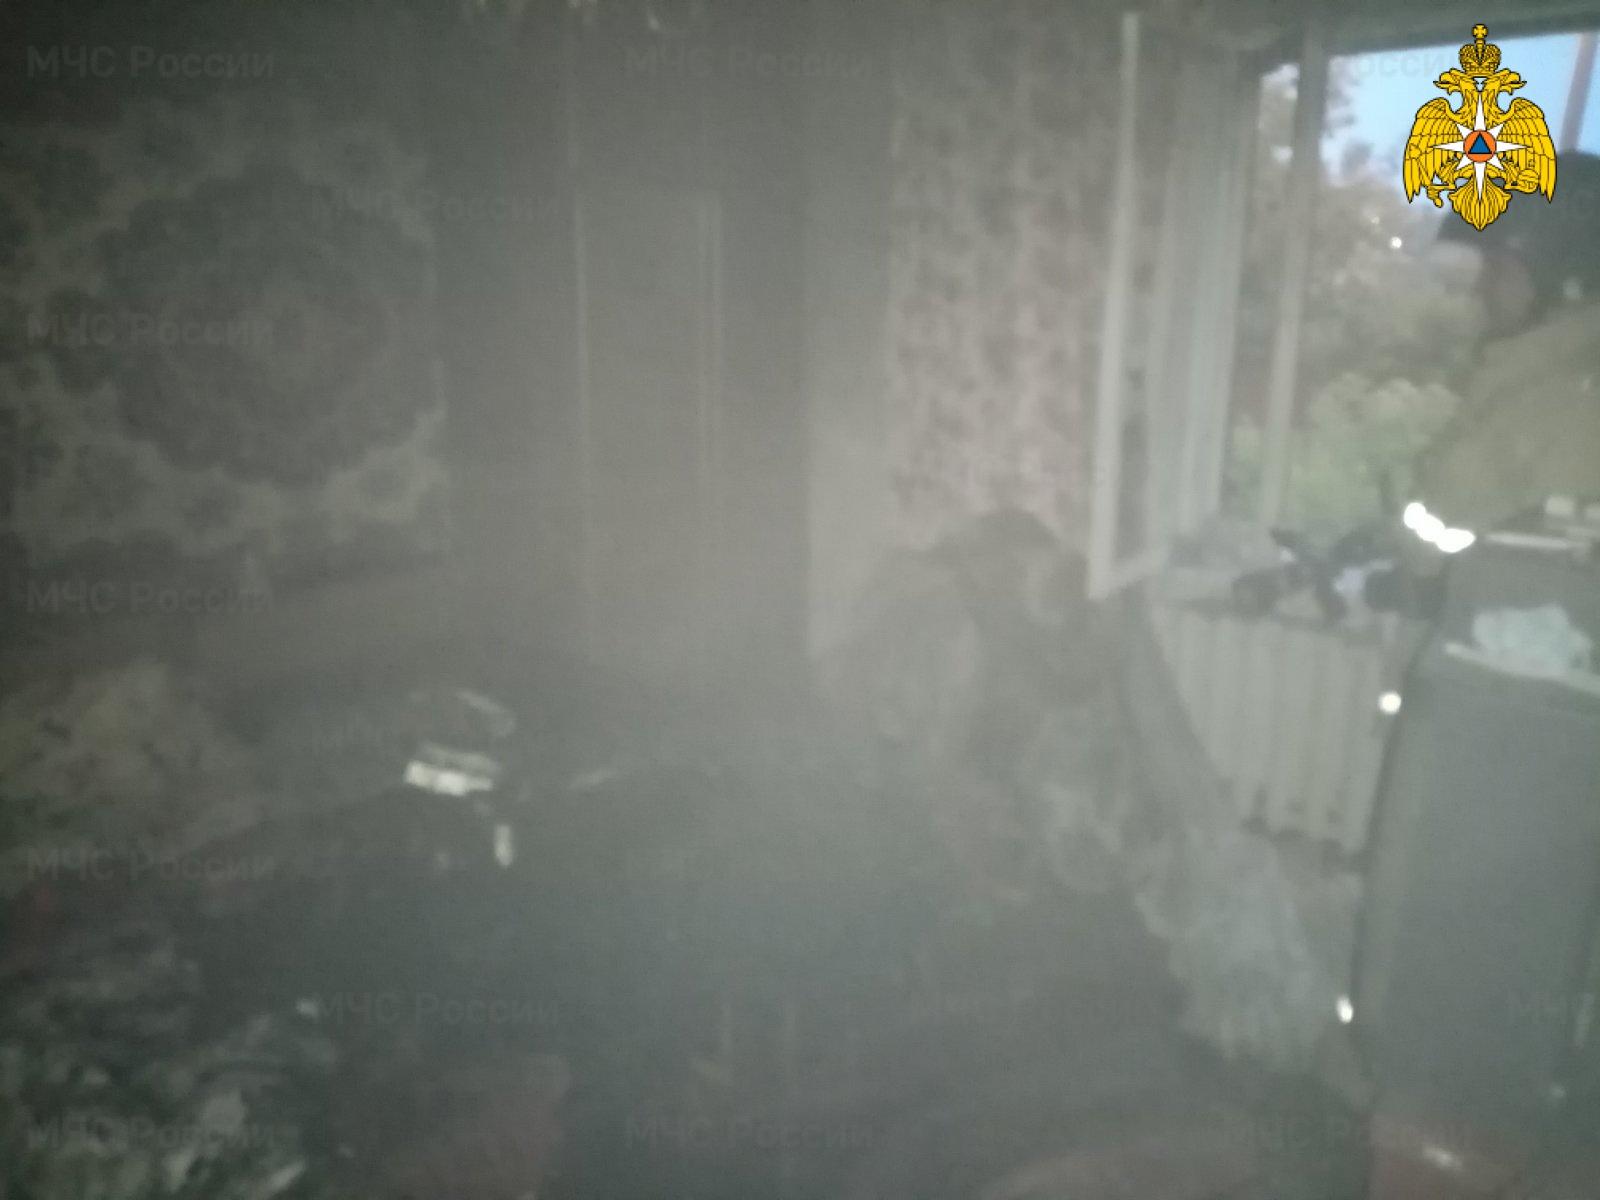 Пожар в Дзержинском районе, п. Товарково, ул. Центральная